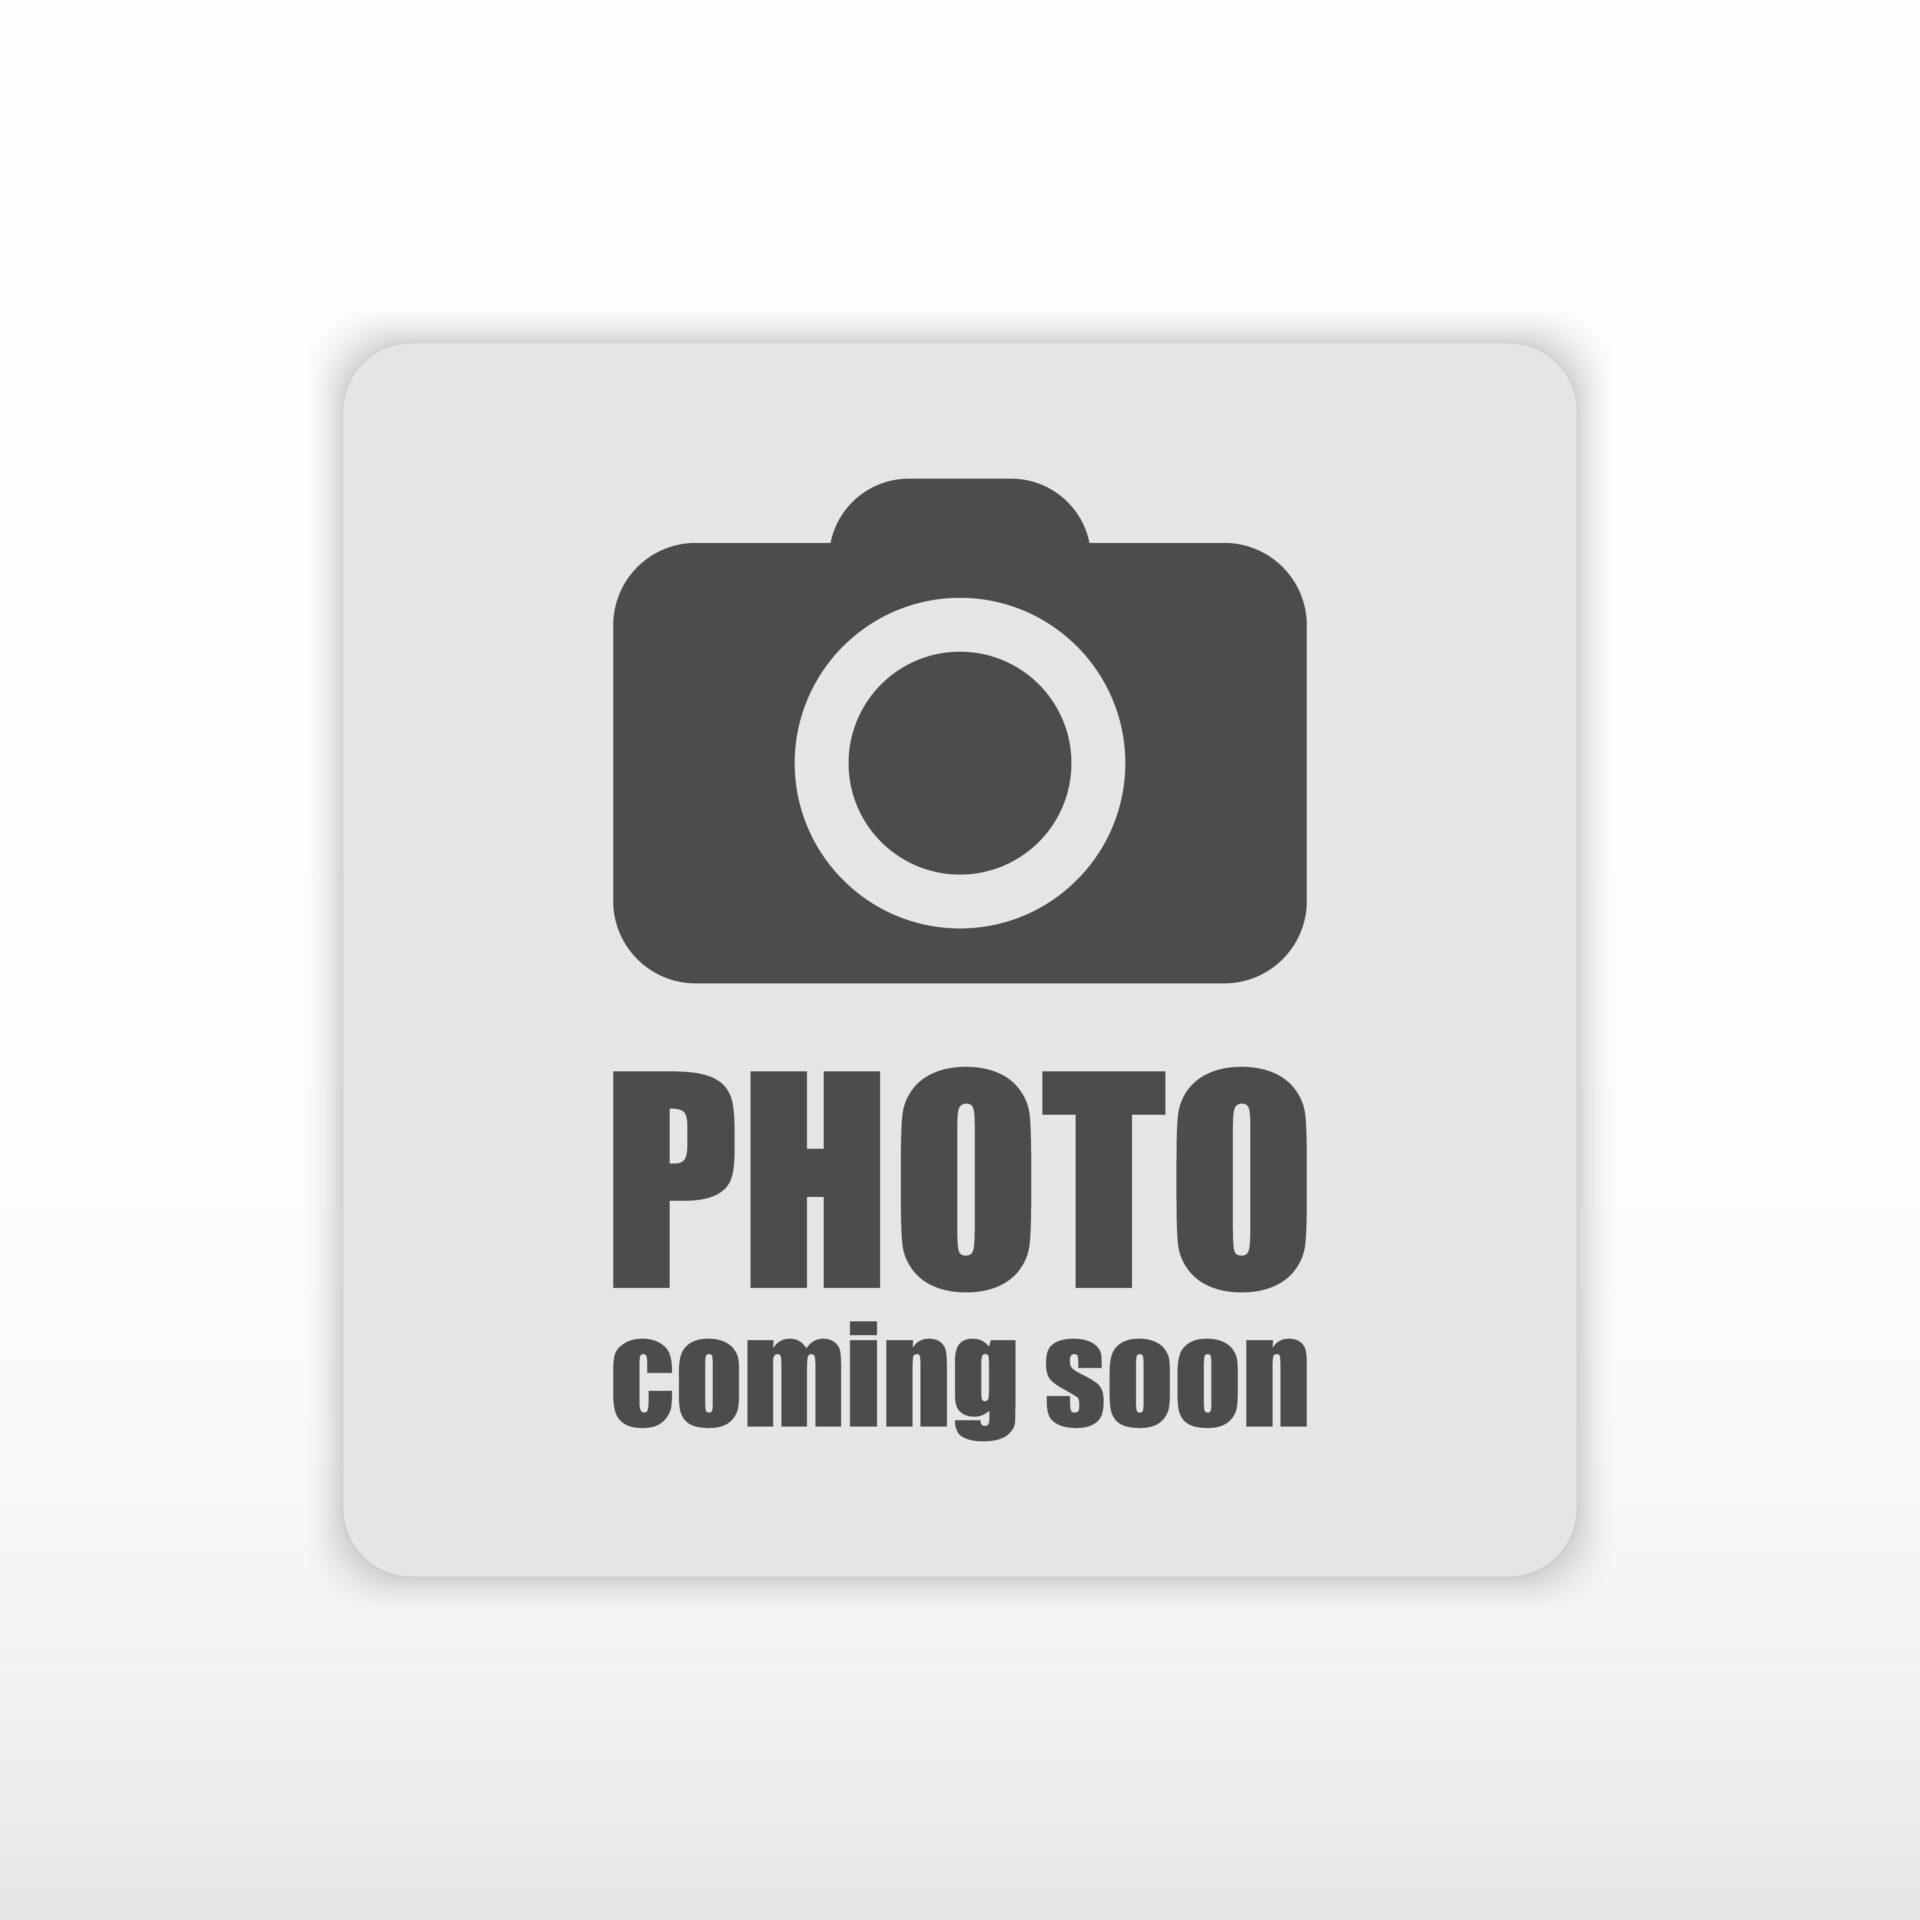 shutterstock_726018910